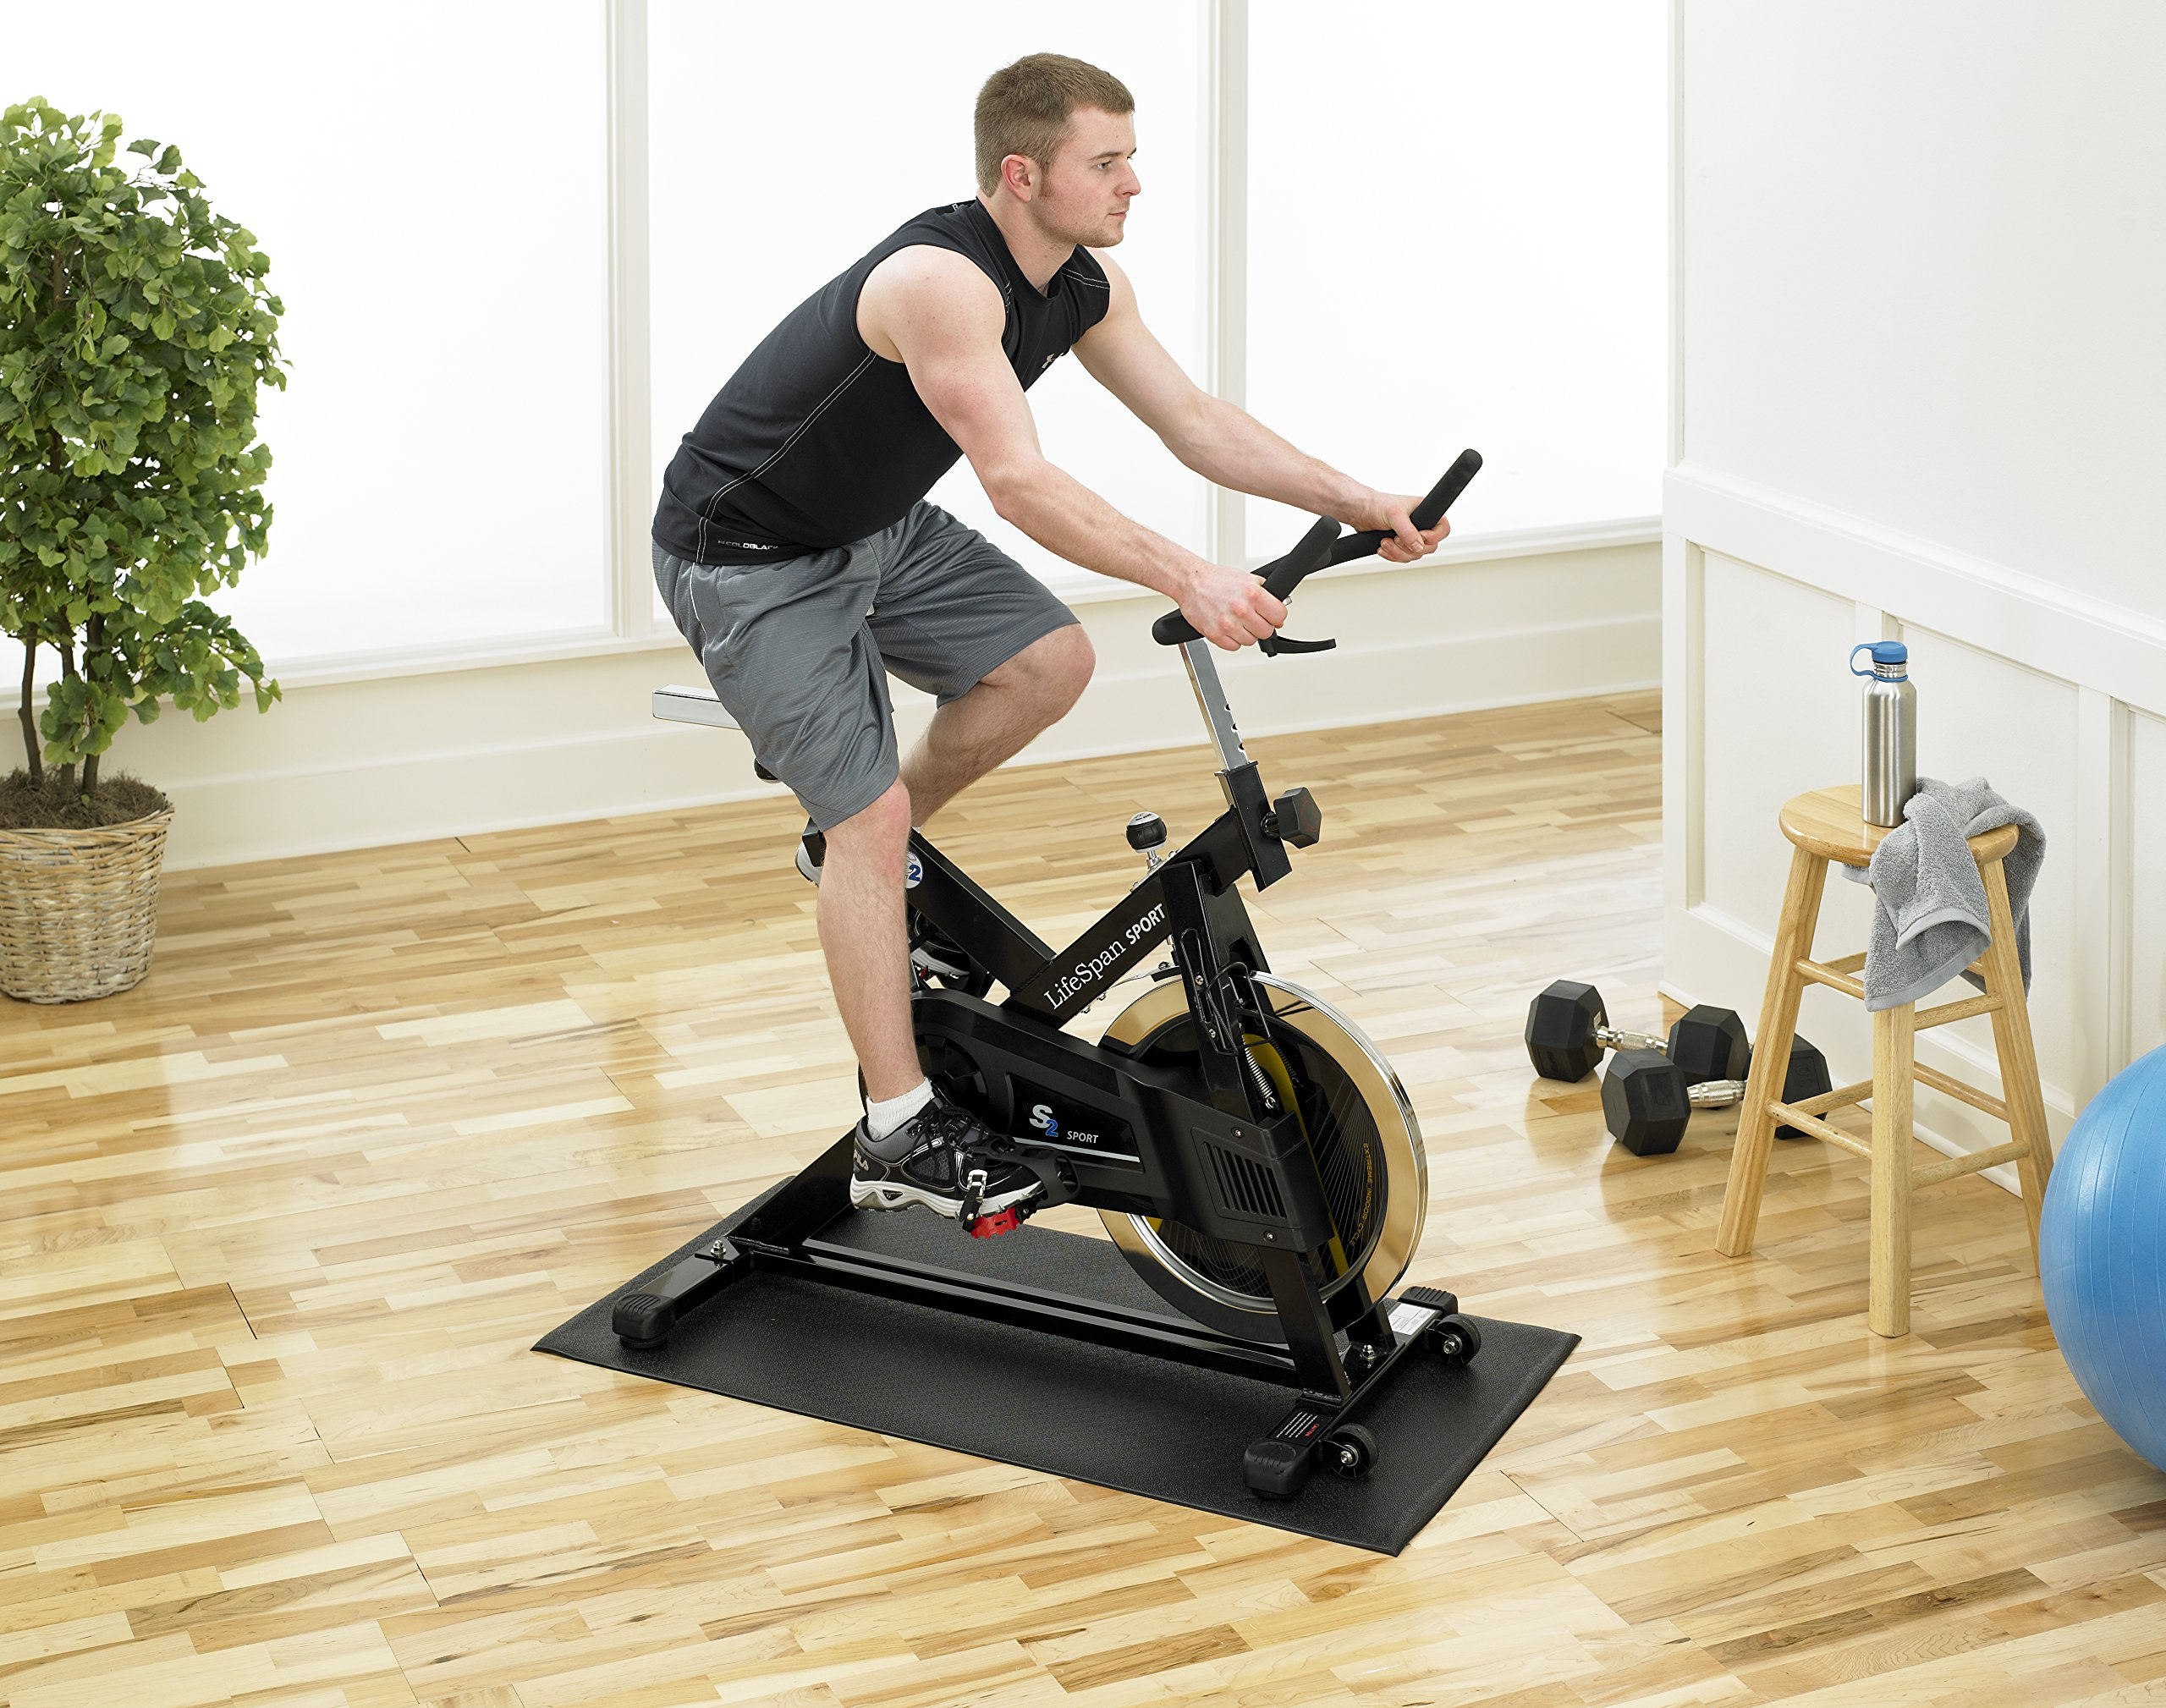 9 Best Exercise Bike Mats For Carpet Concret And Hardwood